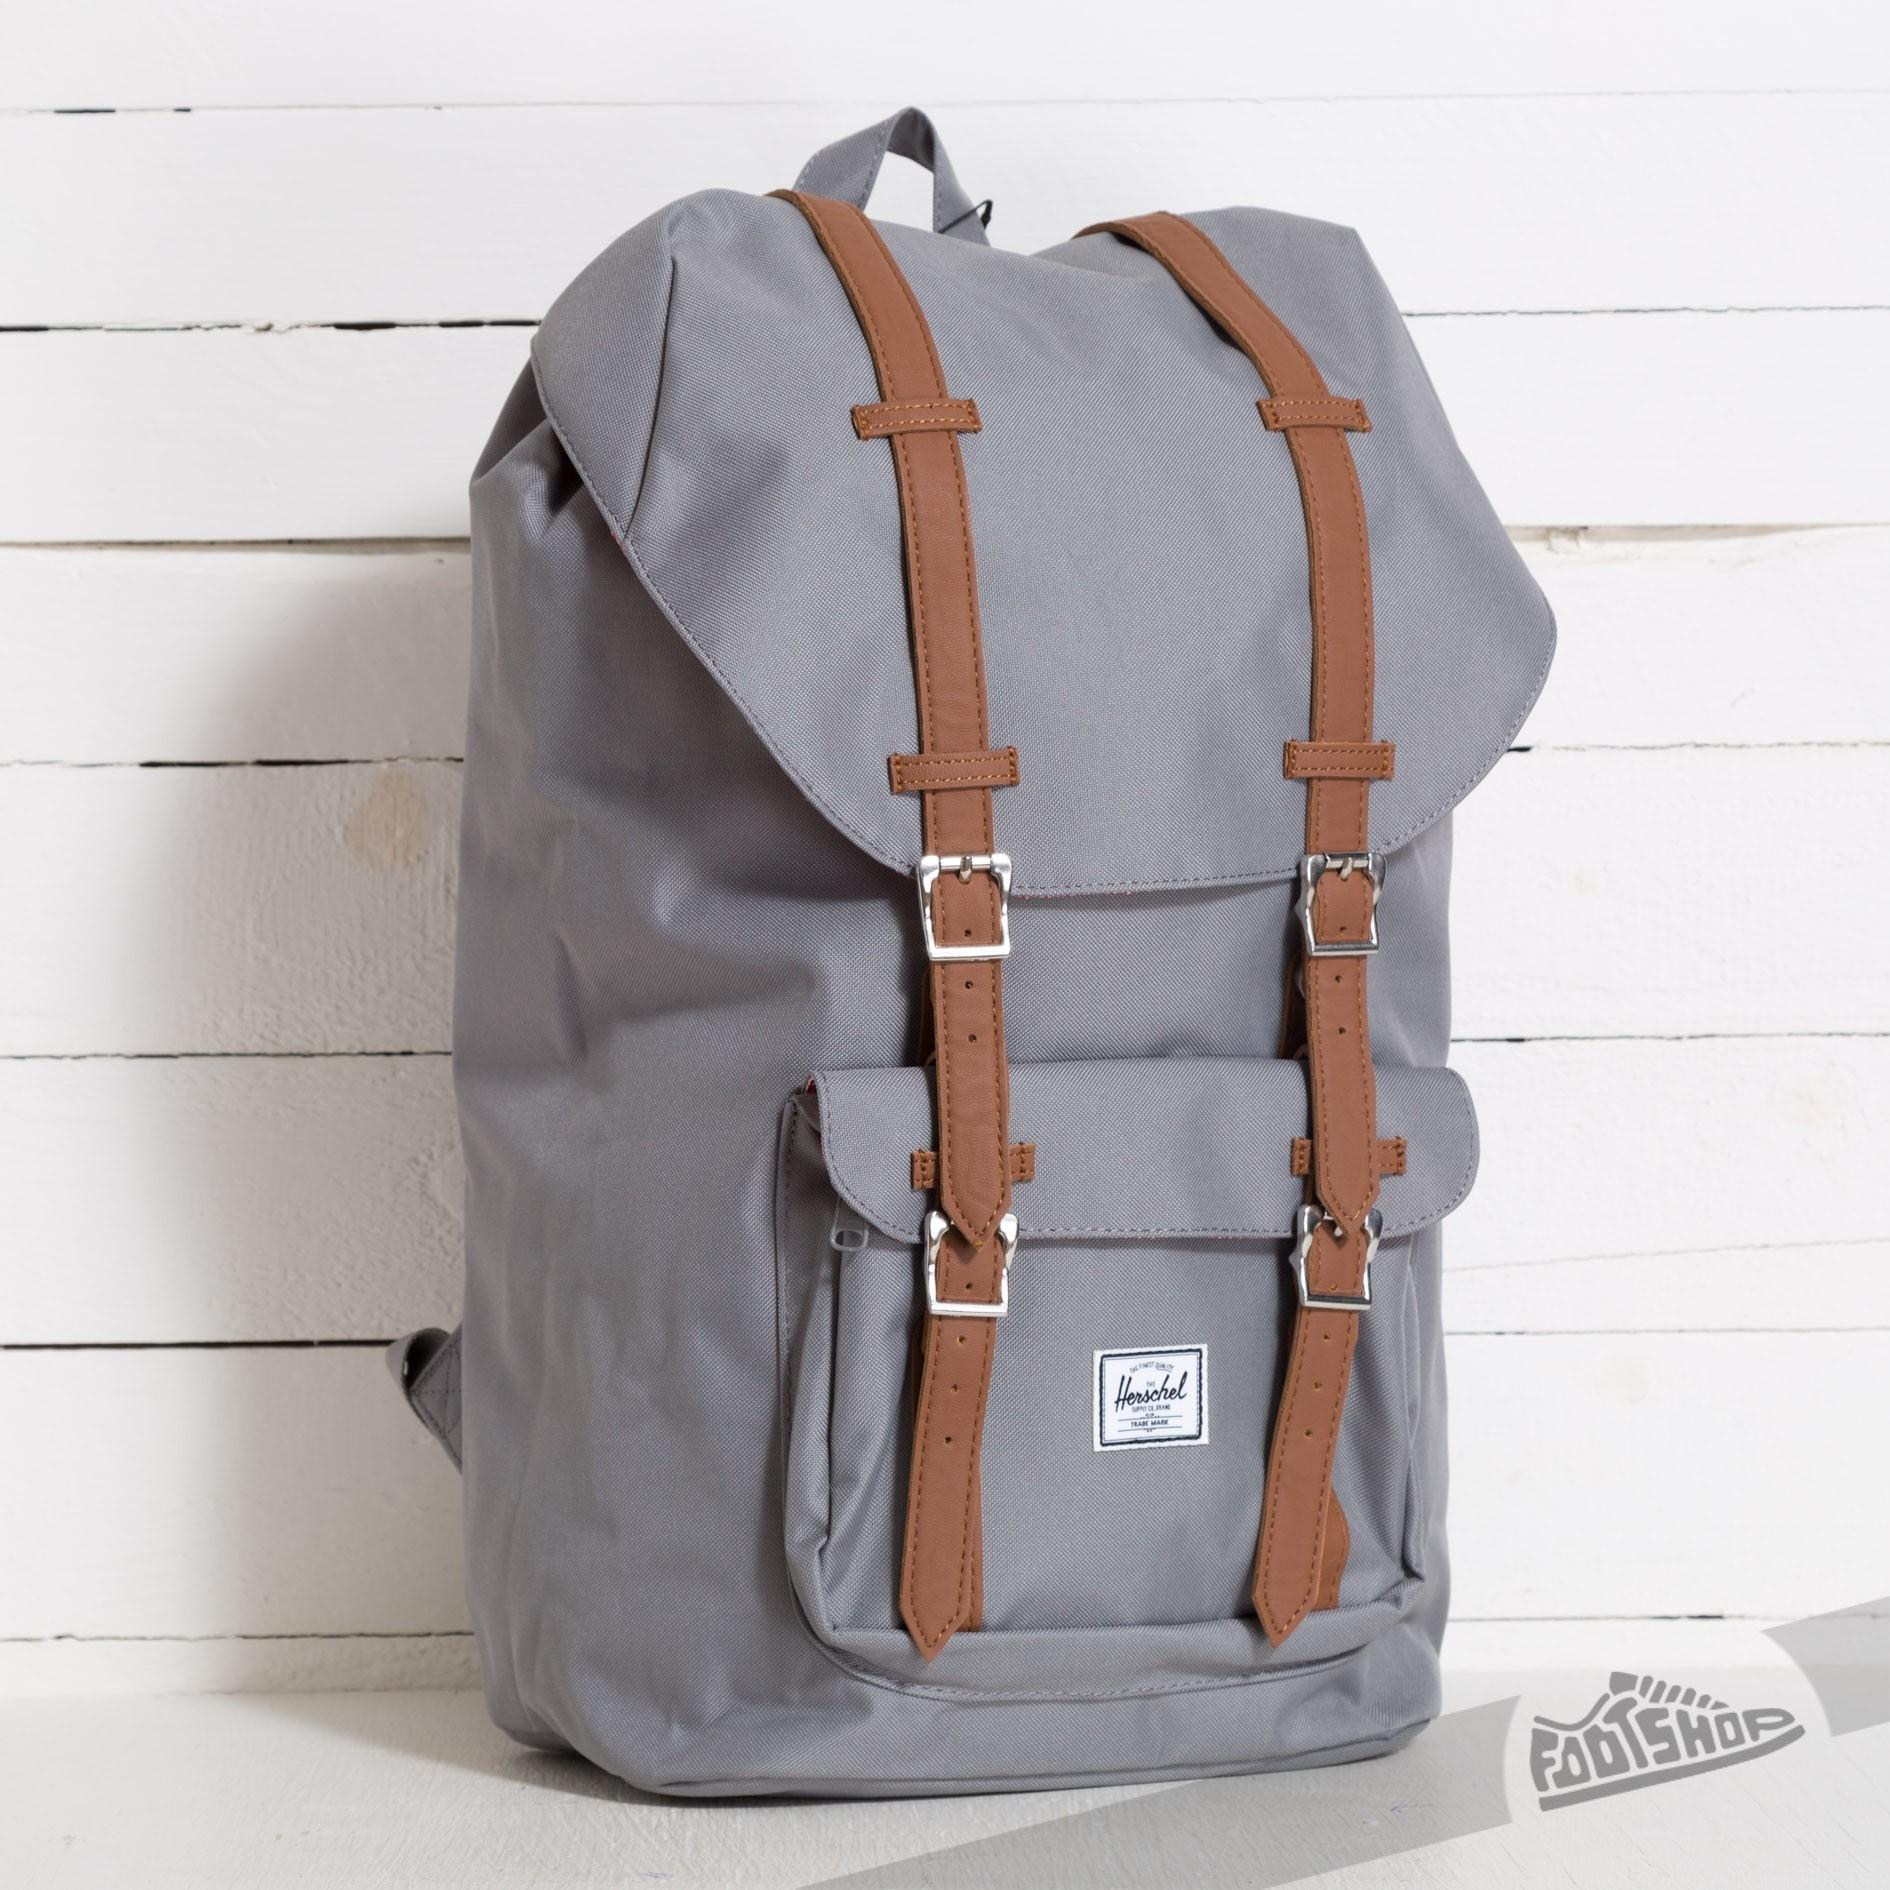 6cd9b349679 Herschel Supply Co. Little America Backpack Grey Tan